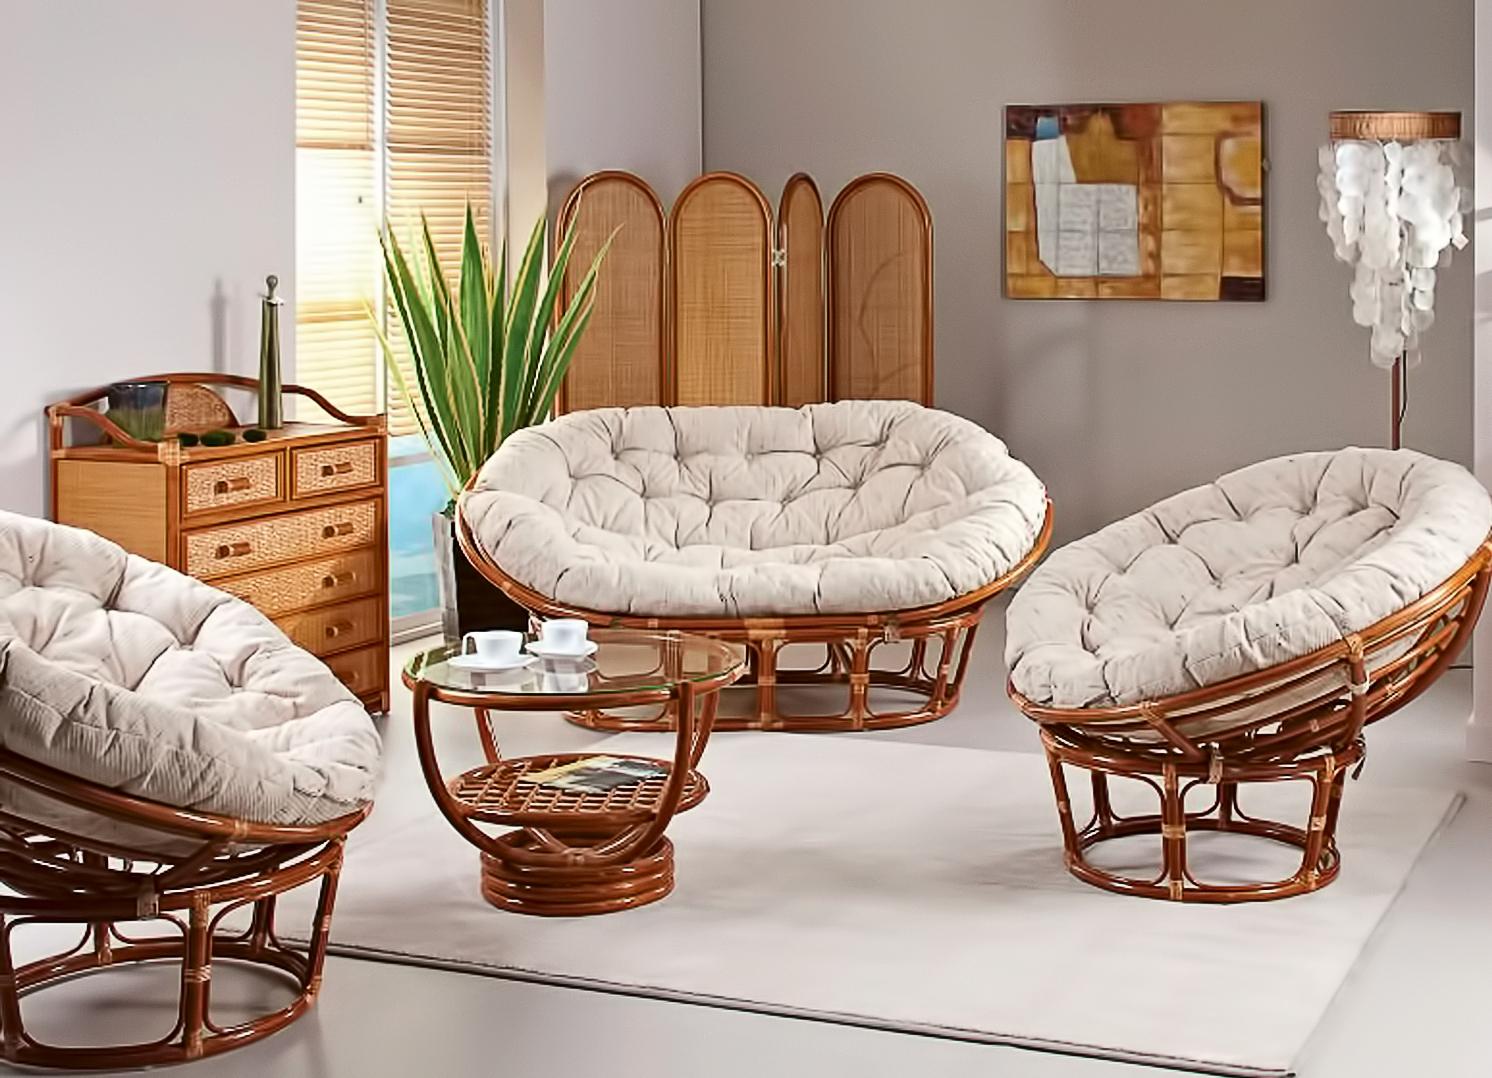 Плетеная мебель для комнаты